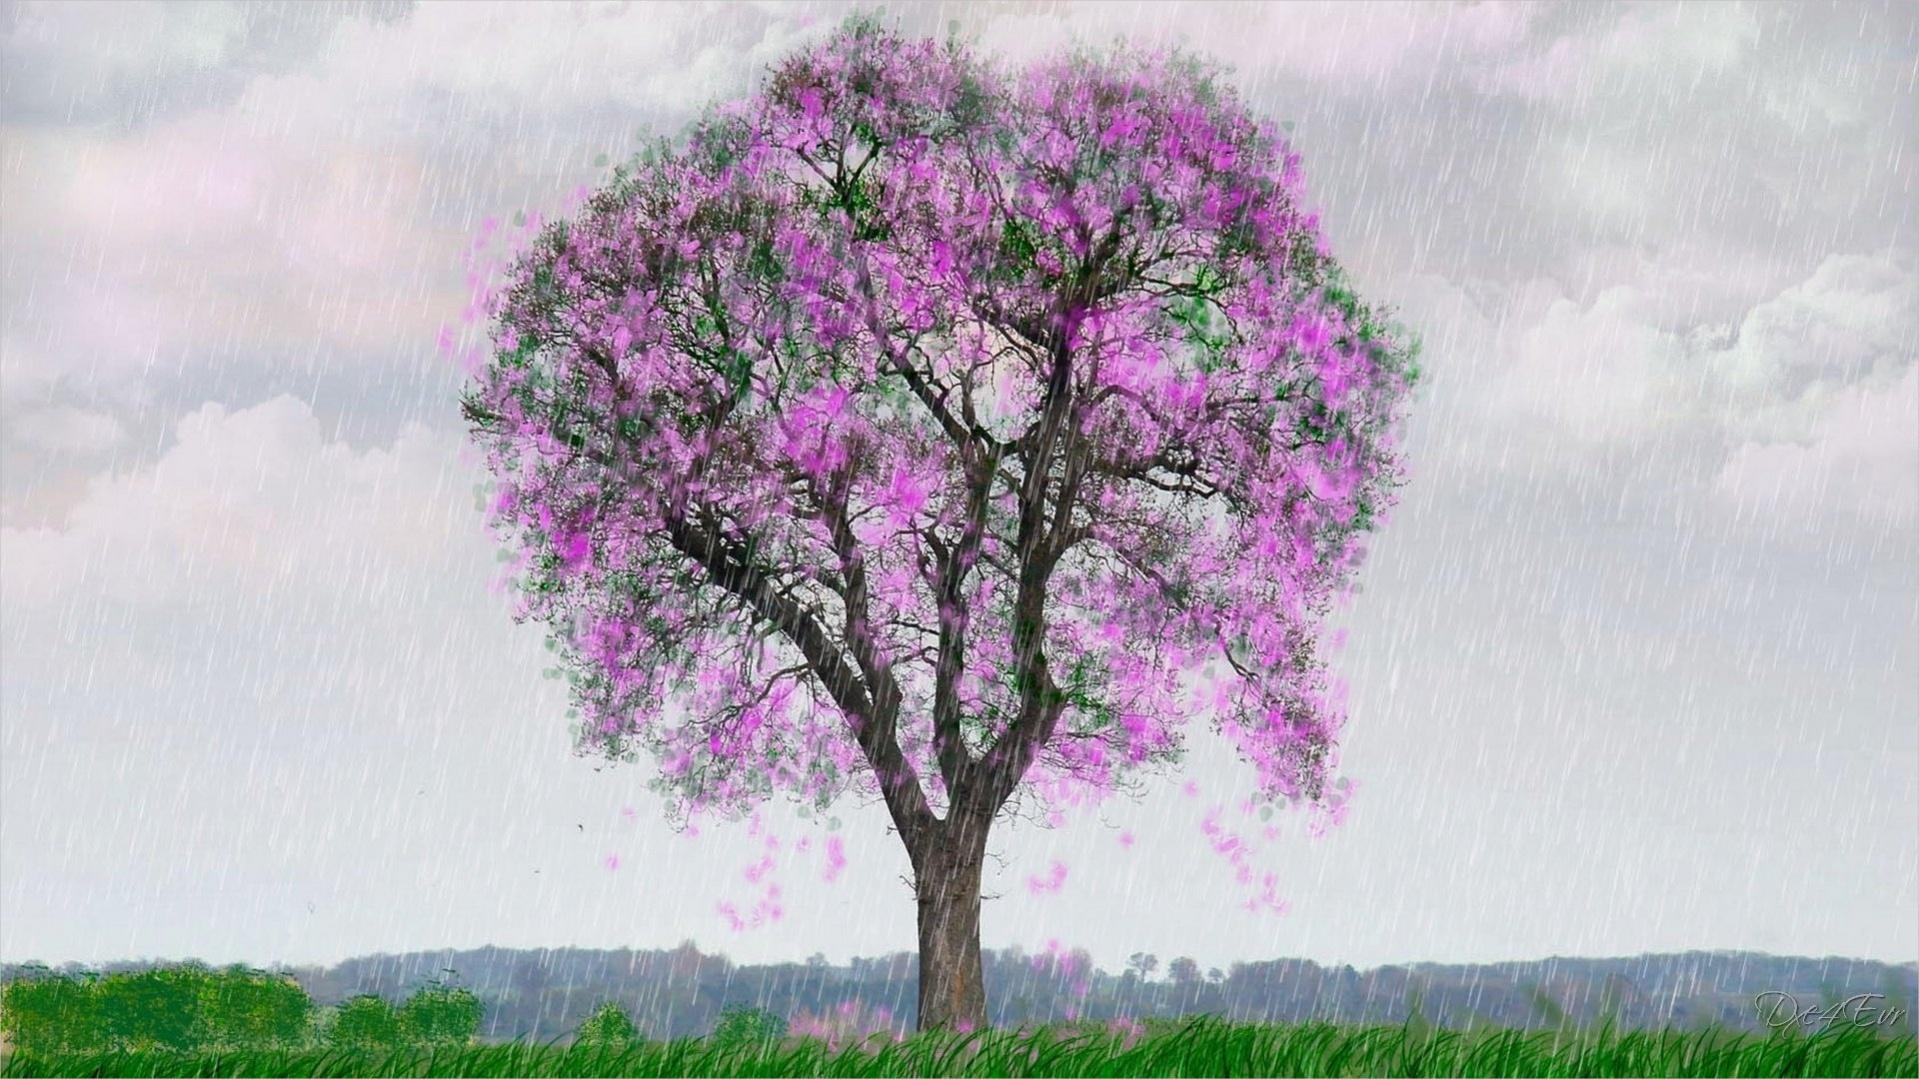 3d Changing Wallpaper 21 Free Spring Wallpapers Jpg Ai Illustrator Download